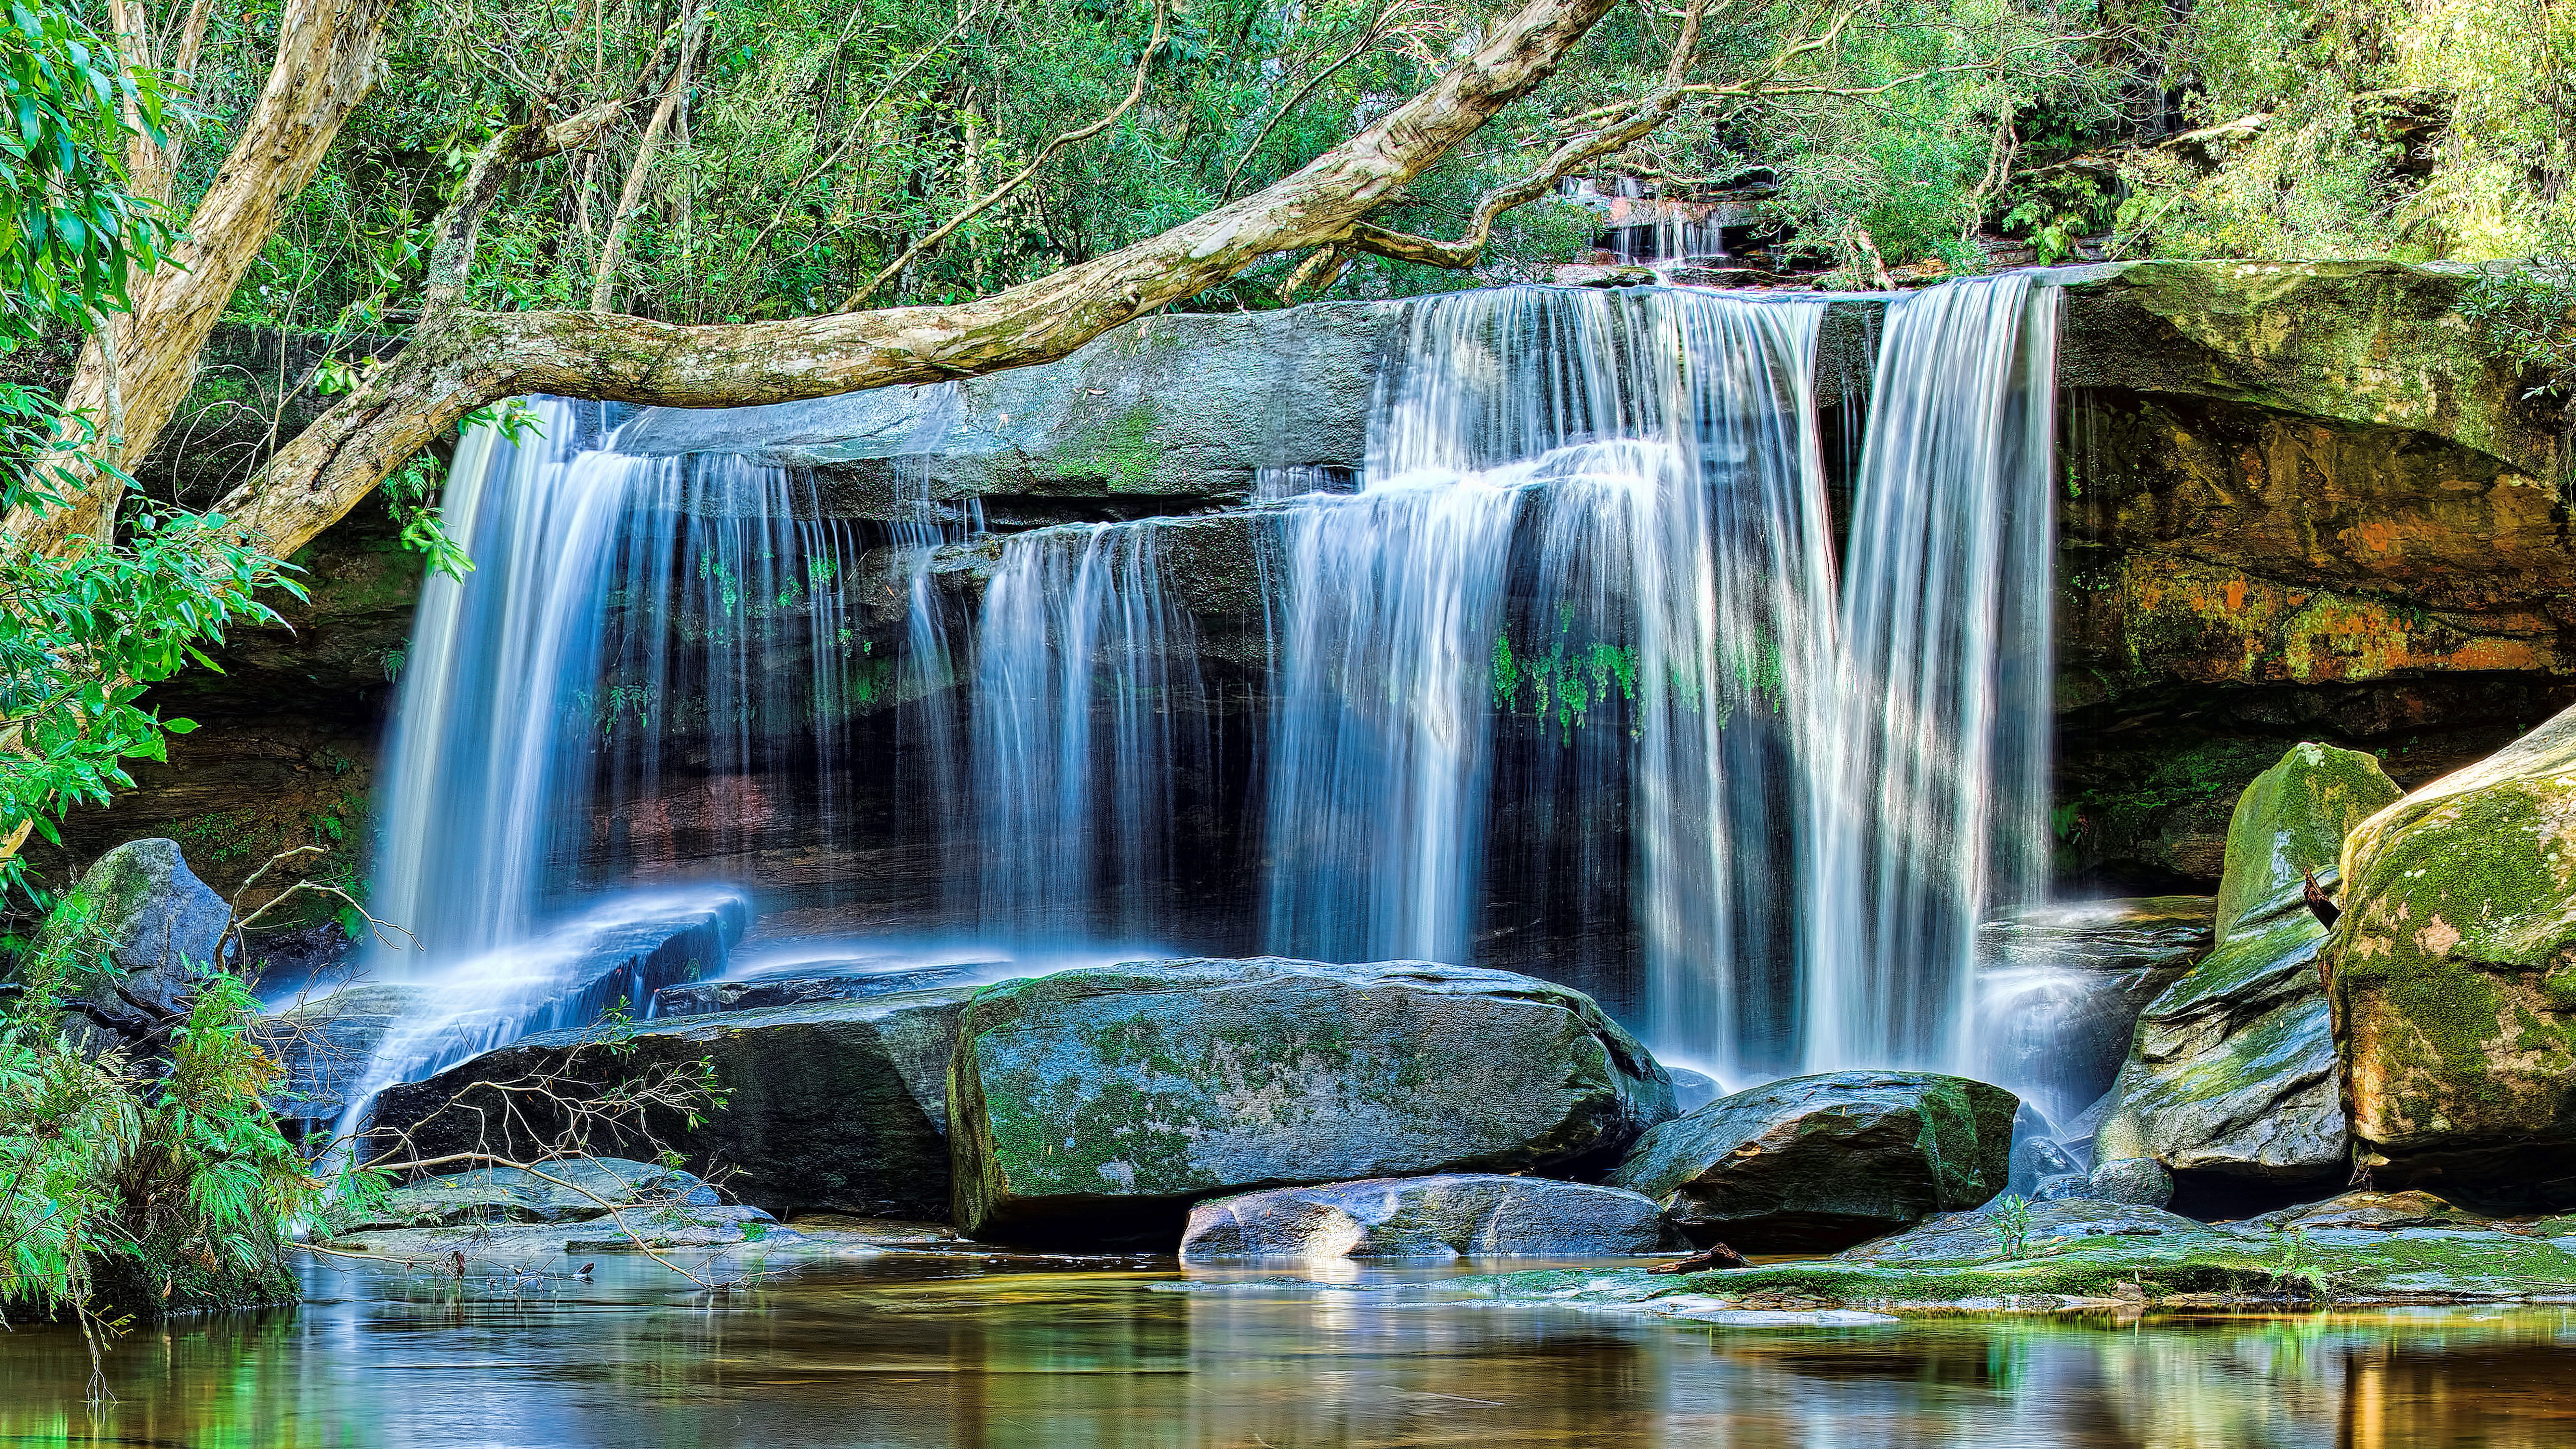 8k ultra hd nature waterfall wallpaper hd | Nature in 2019 | Waterfall wallpaper, Waterfall, Nature